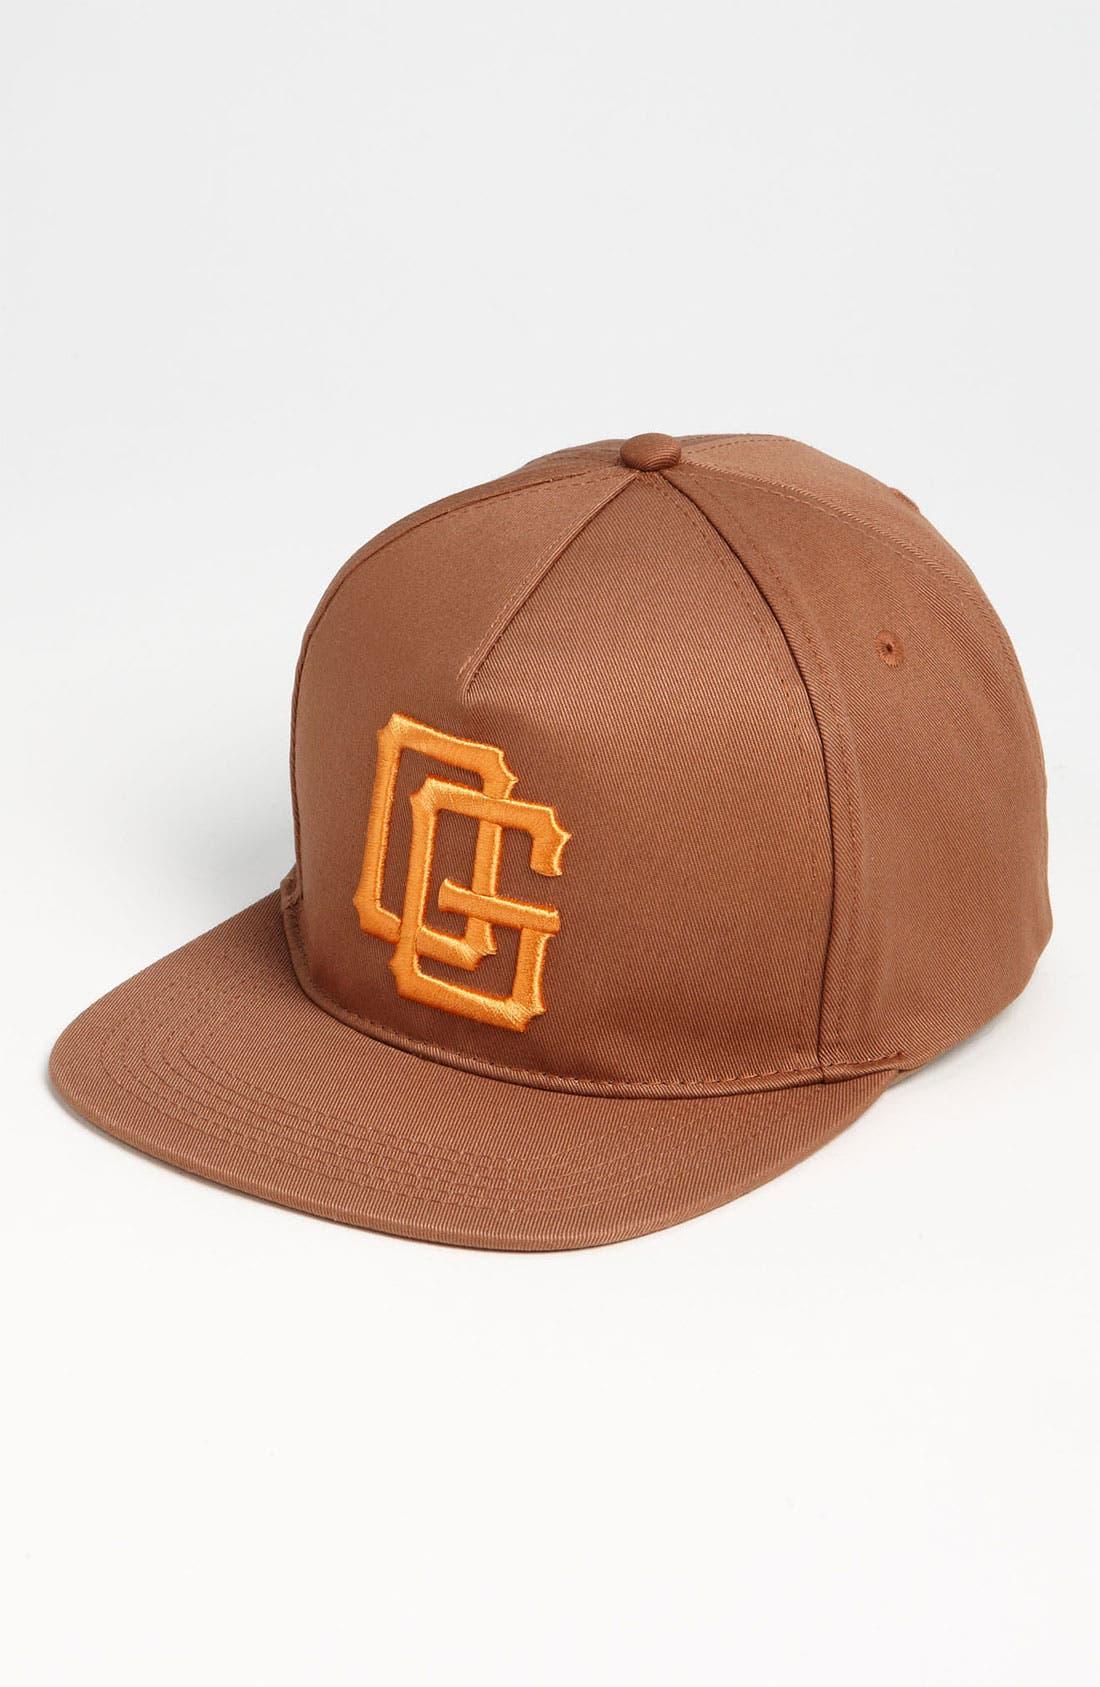 Main Image - Obey 'Double OG' Snapback Baseball Cap